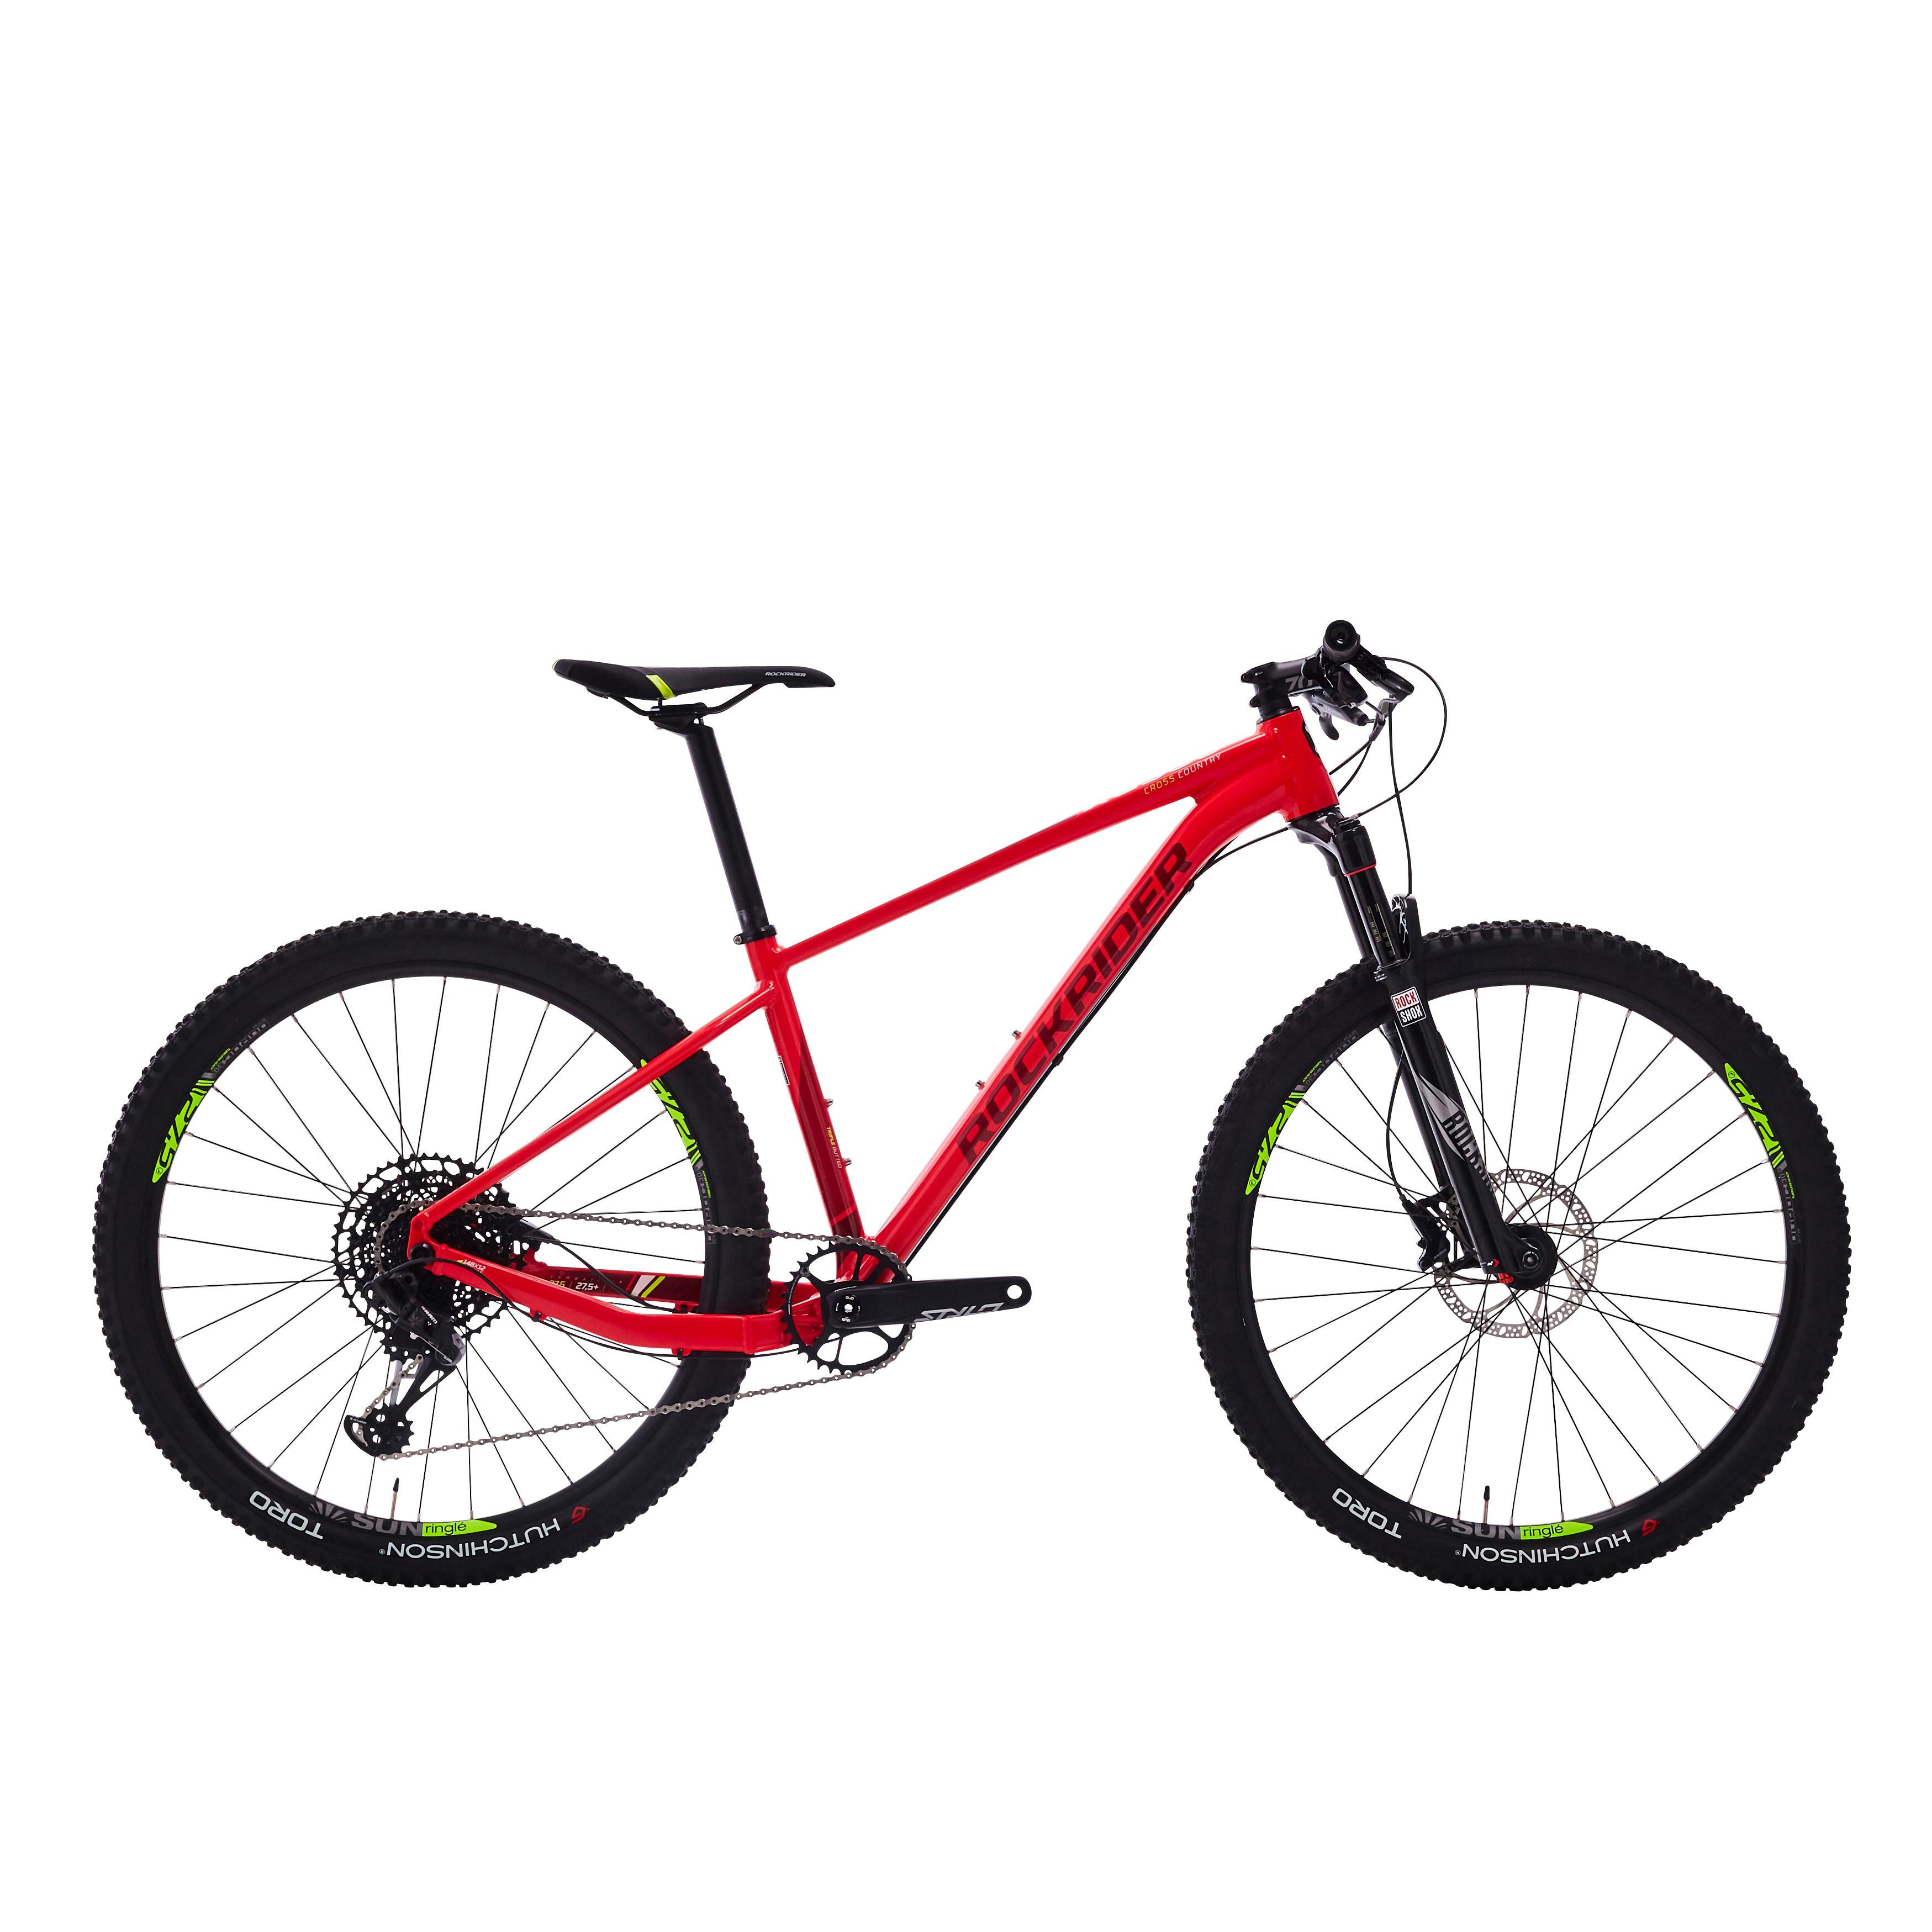 Rockrider MTB XC 500 27.5 SRAM GX Eagle 1x12-speed mountainbike